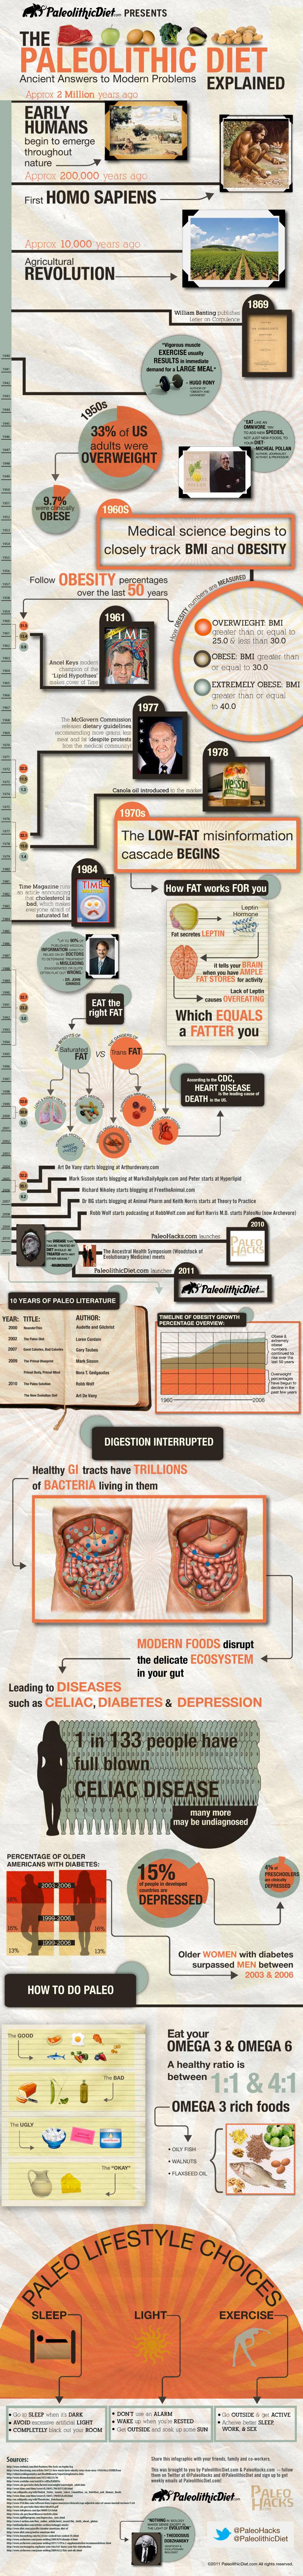 PaleolithicDietExplained-800.original